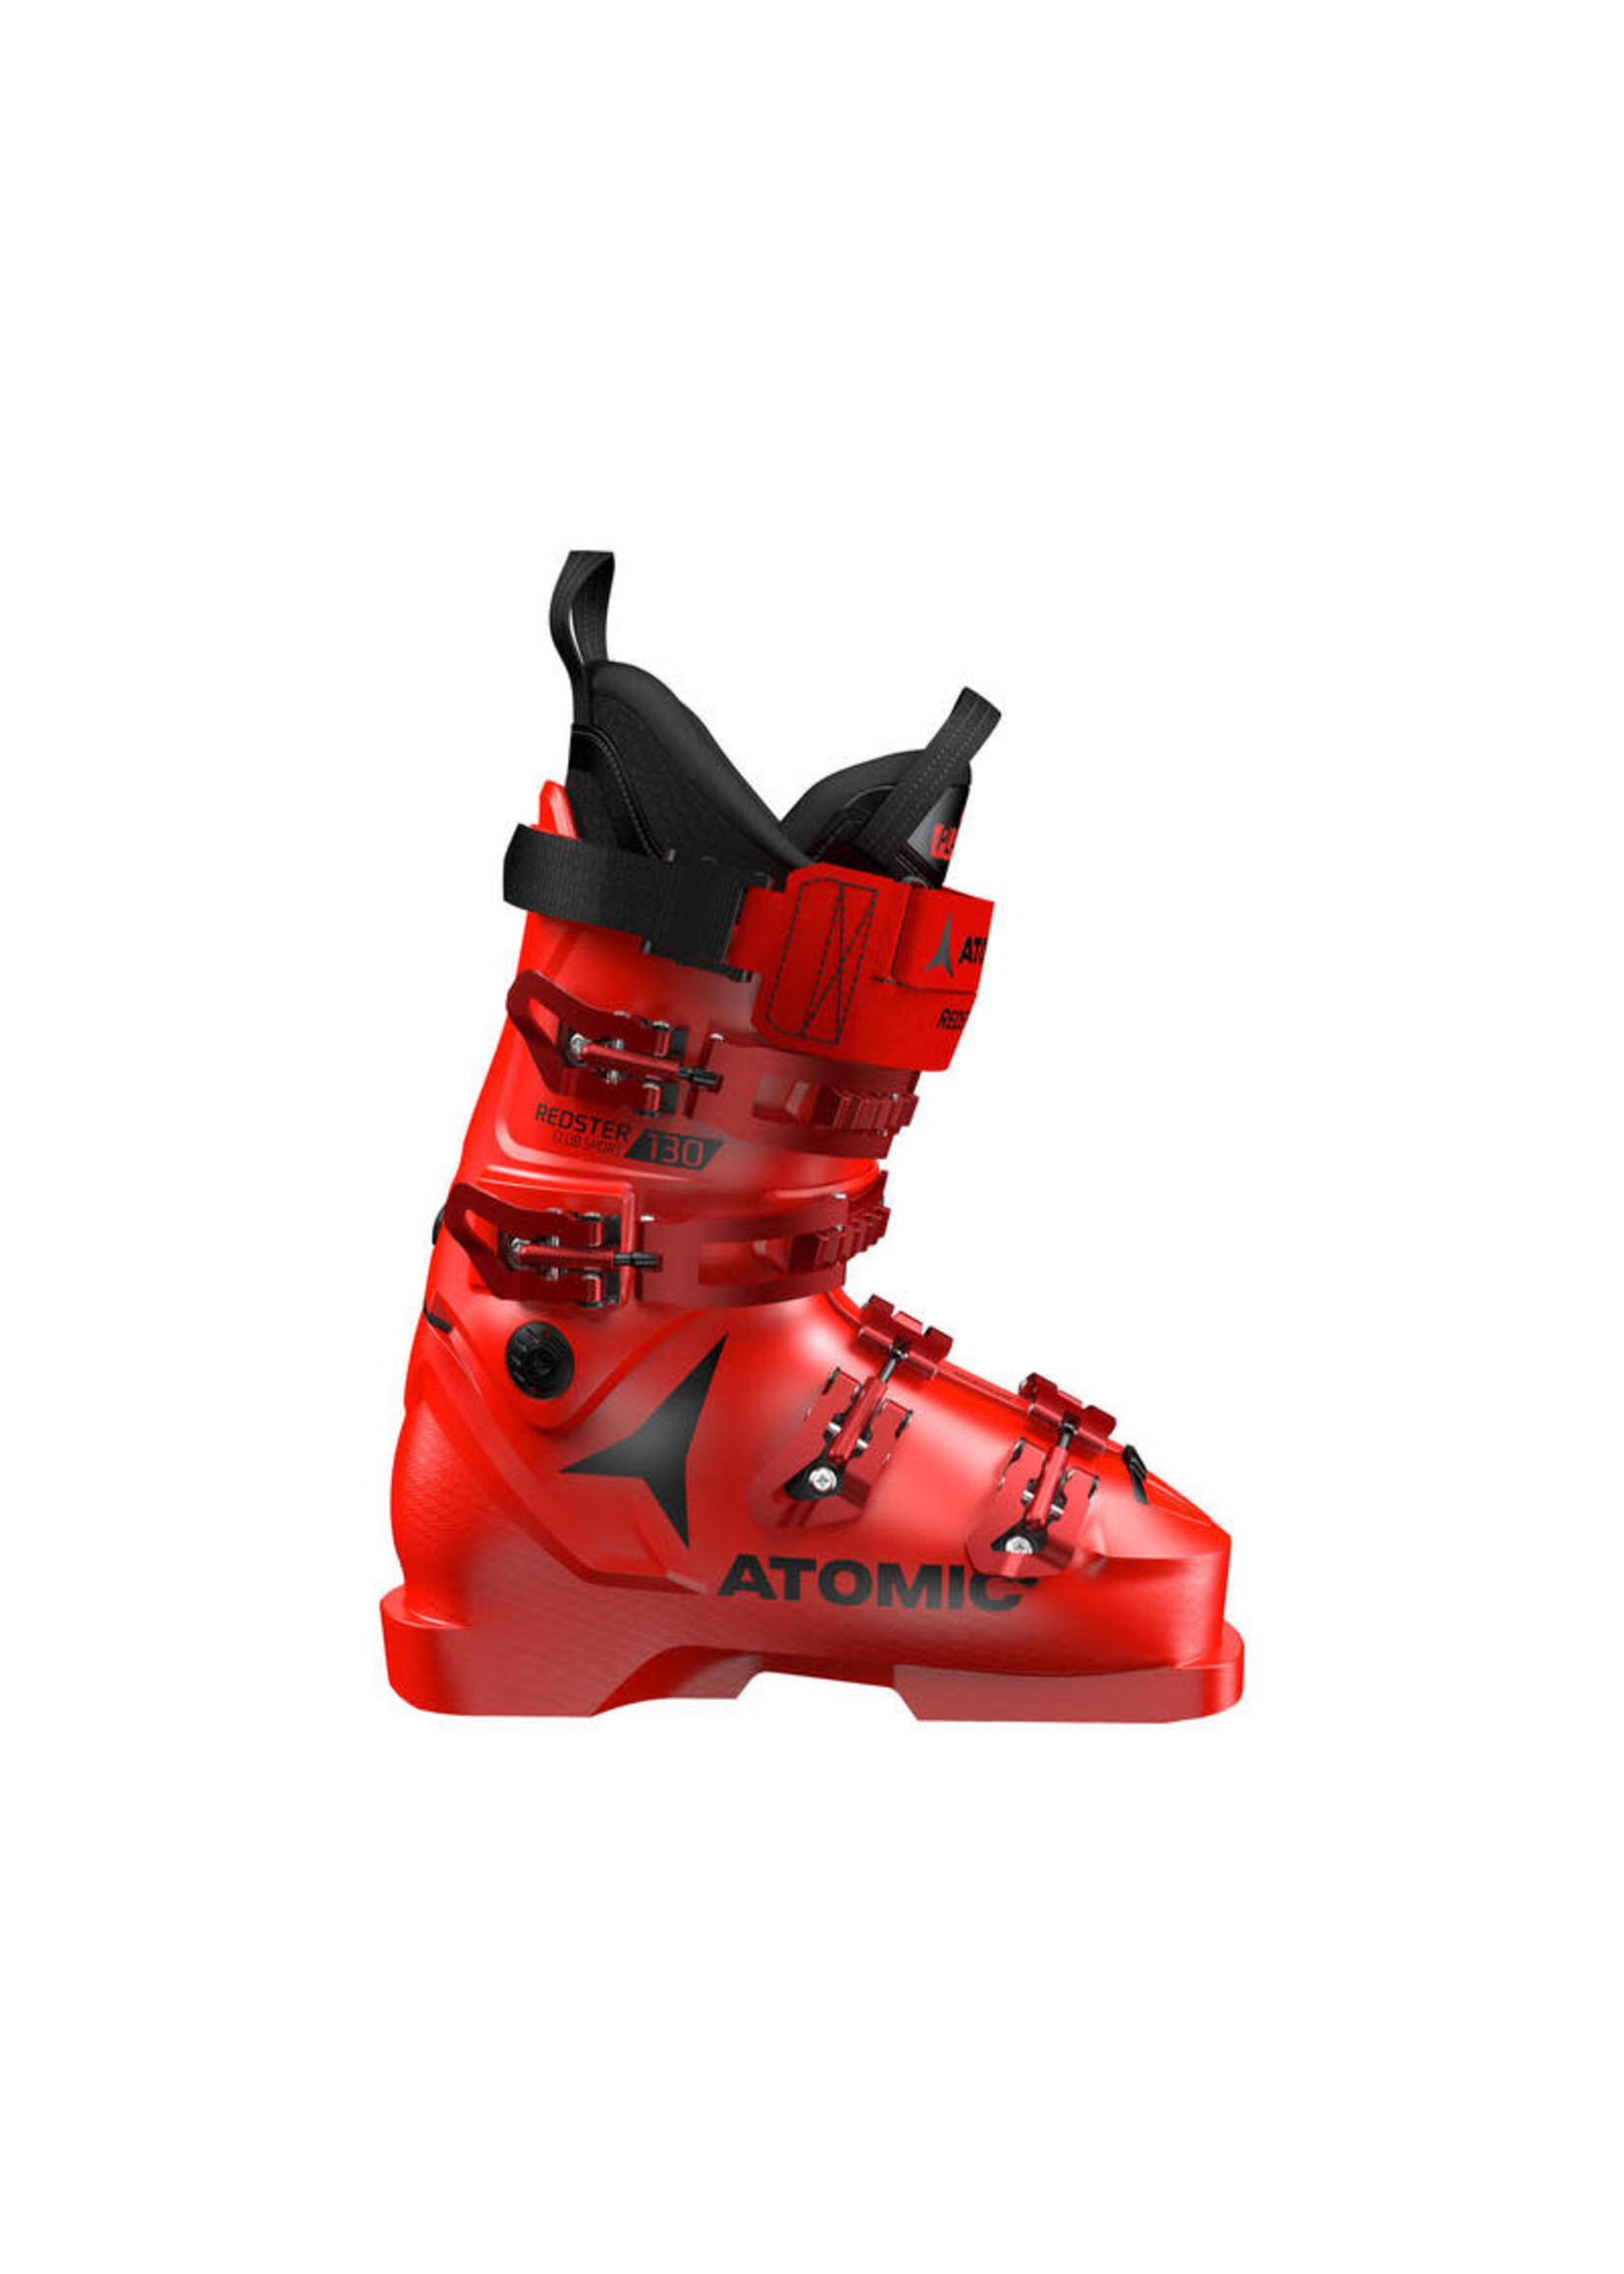 Atomic Race Boot Red CS 130